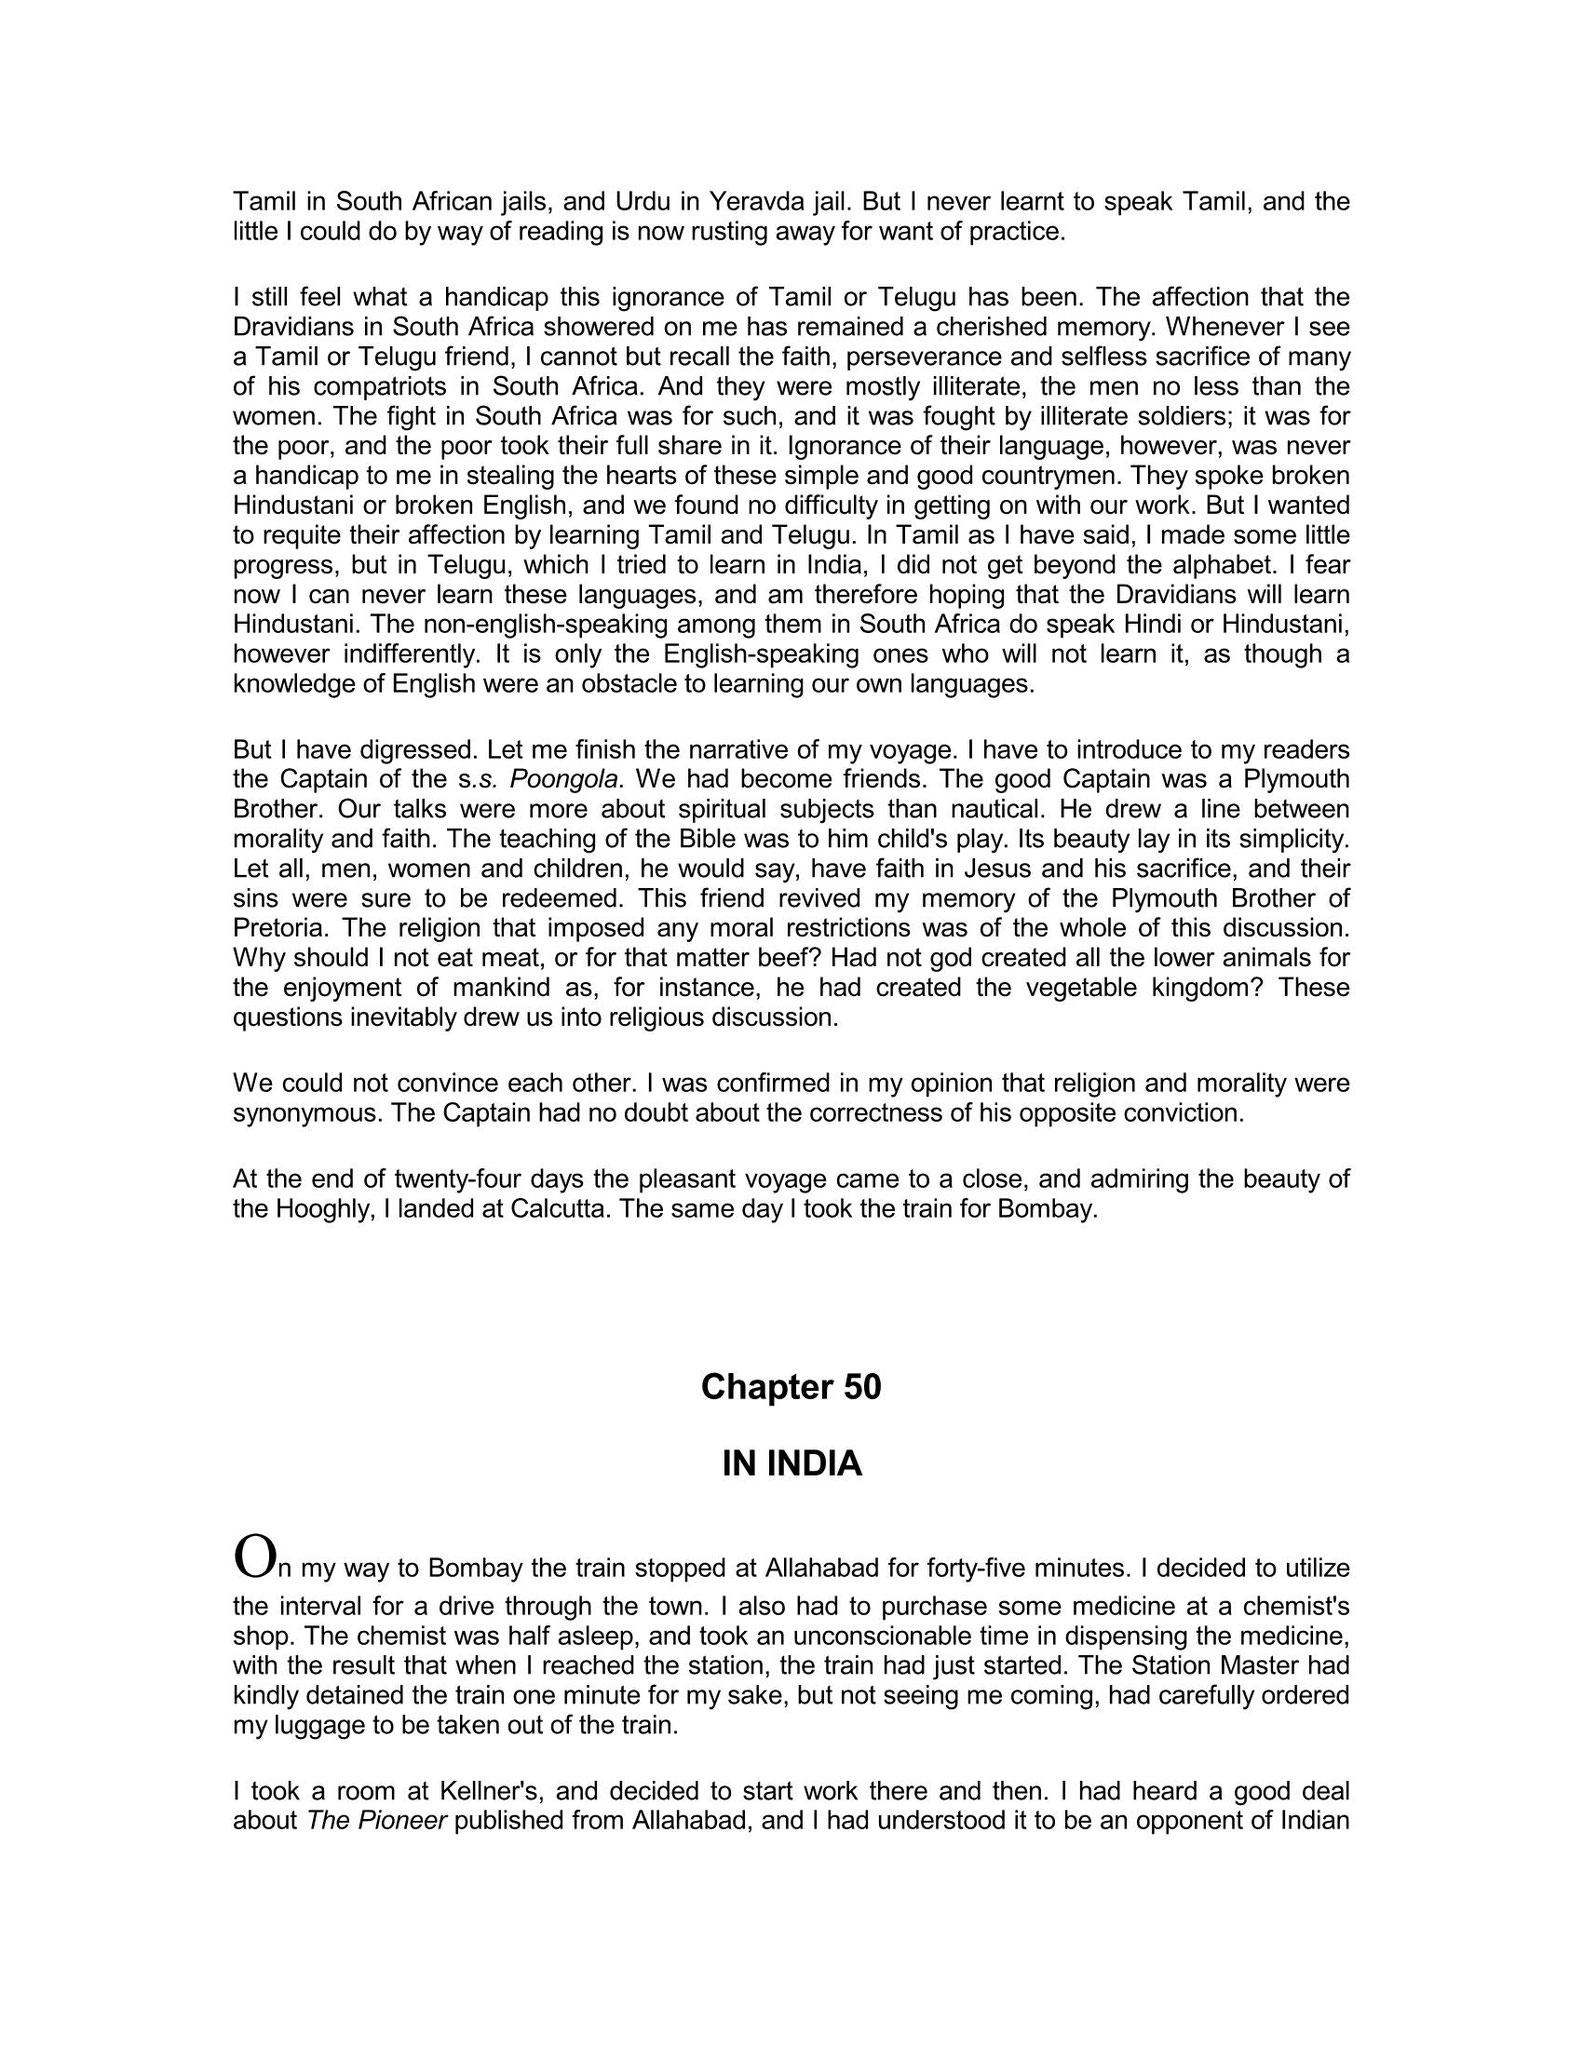 An Autobiography - GandhiServe Foundation